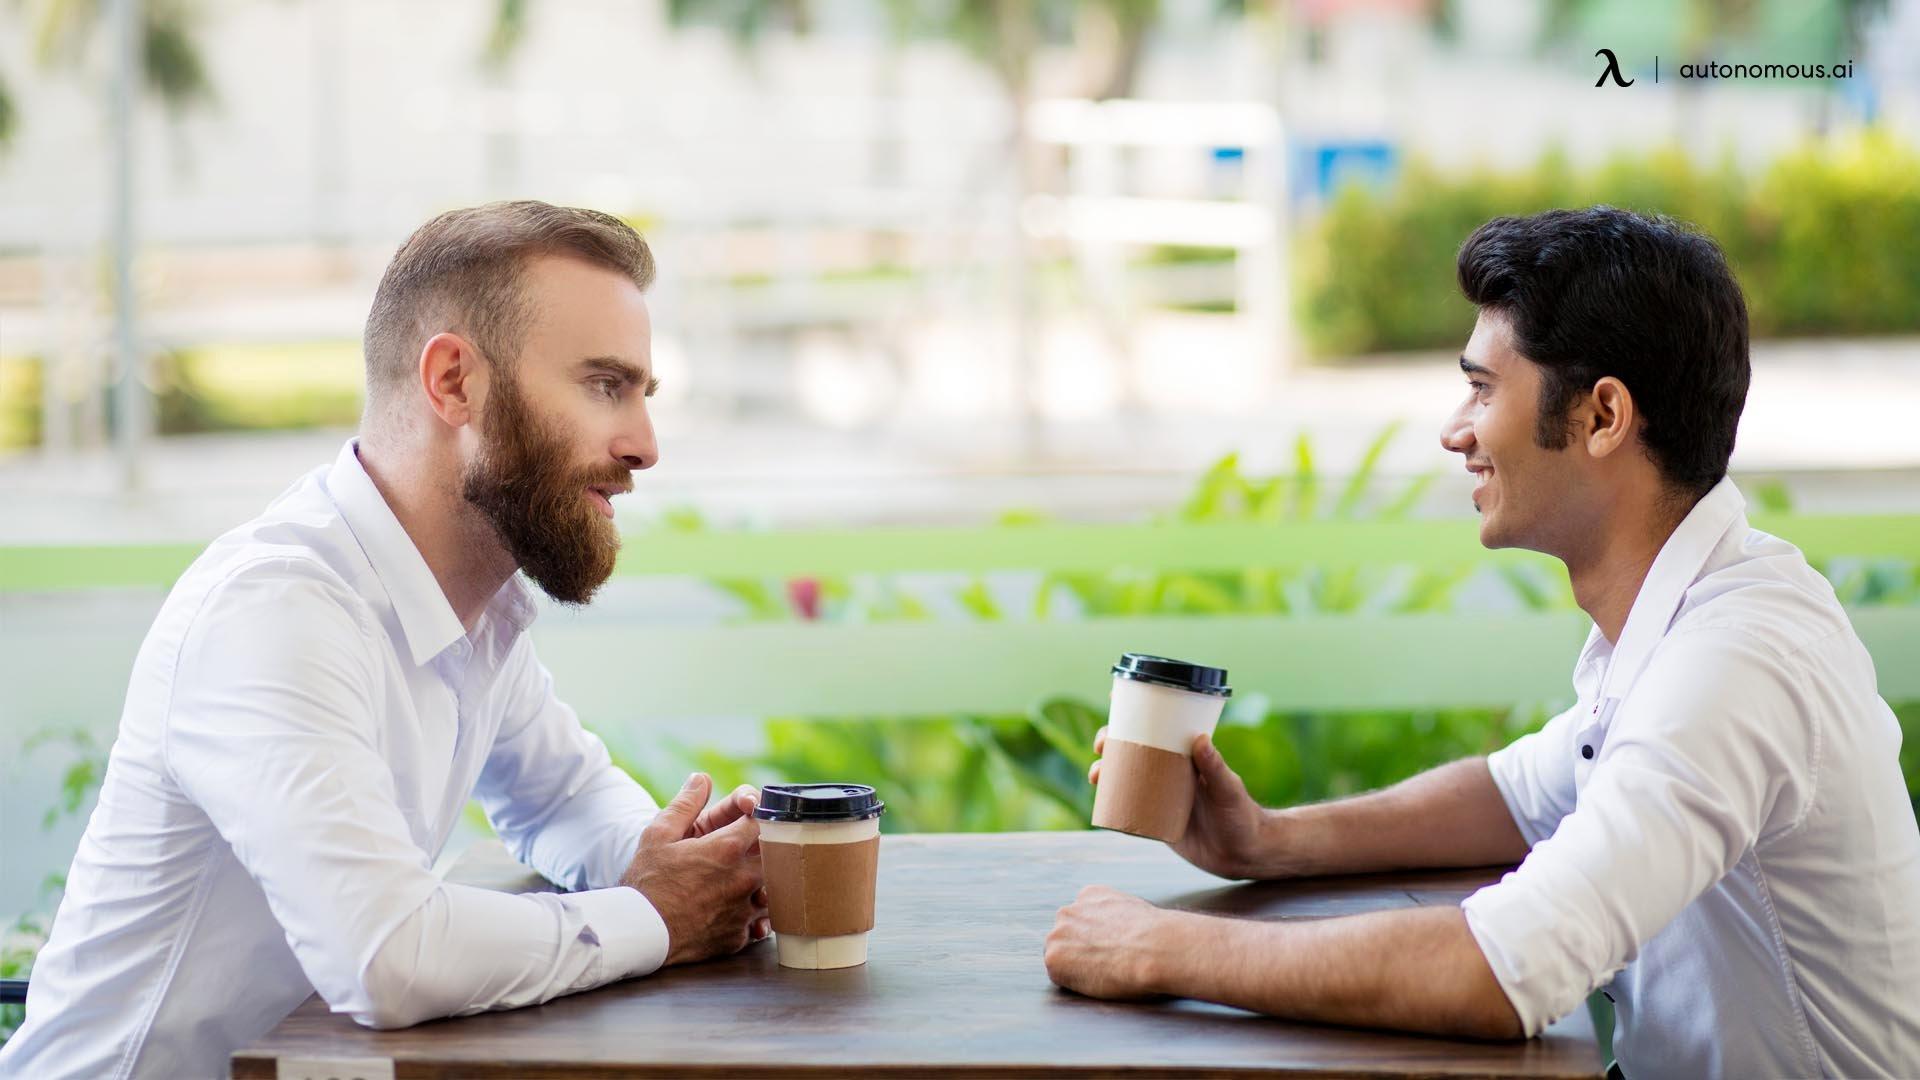 Have non-work conversations